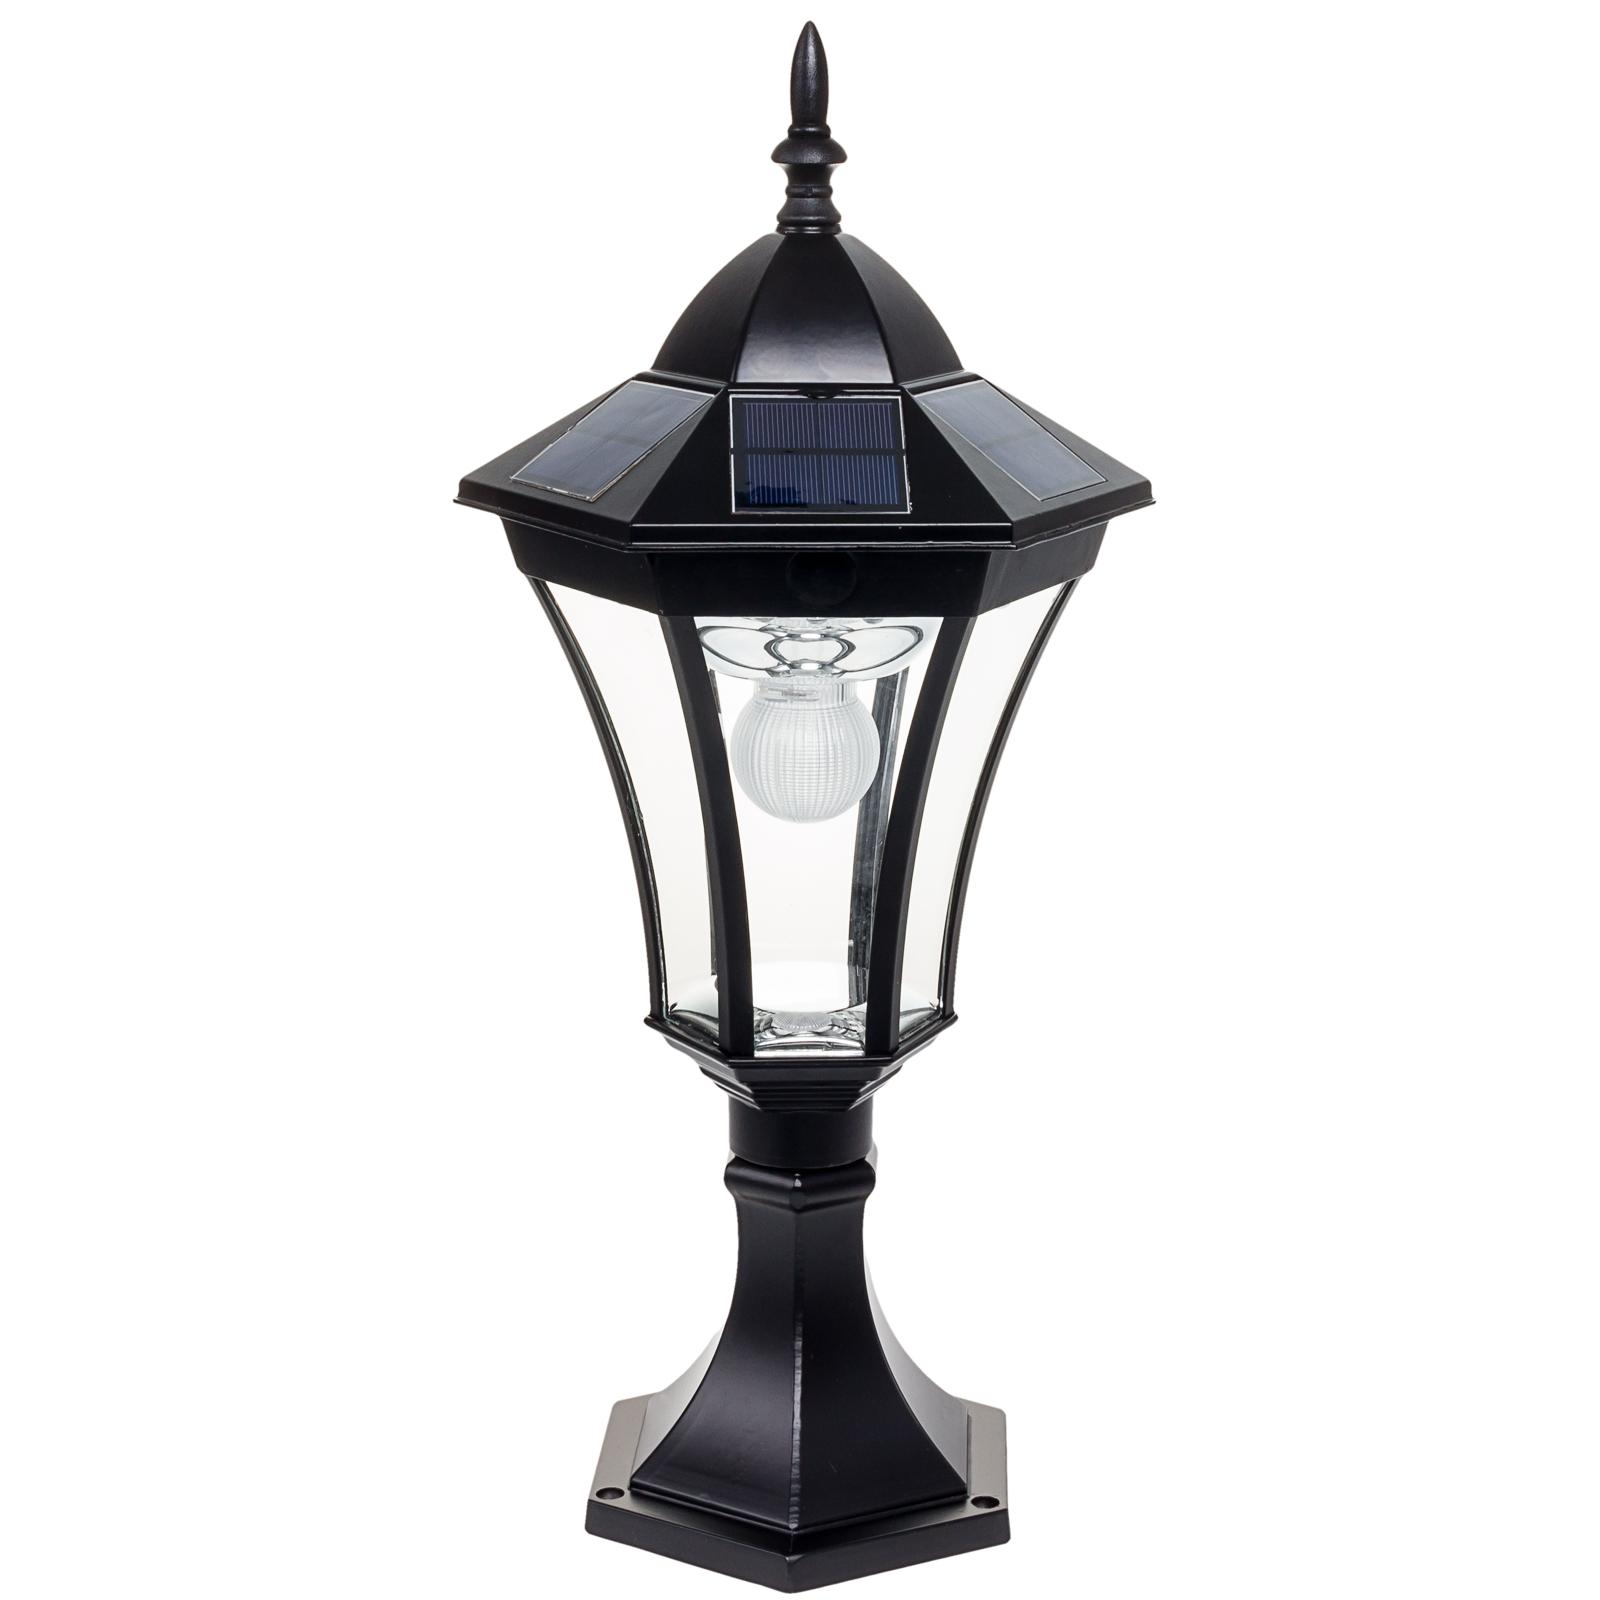 black solar 19 led outdoor garden lamp column post deck street light